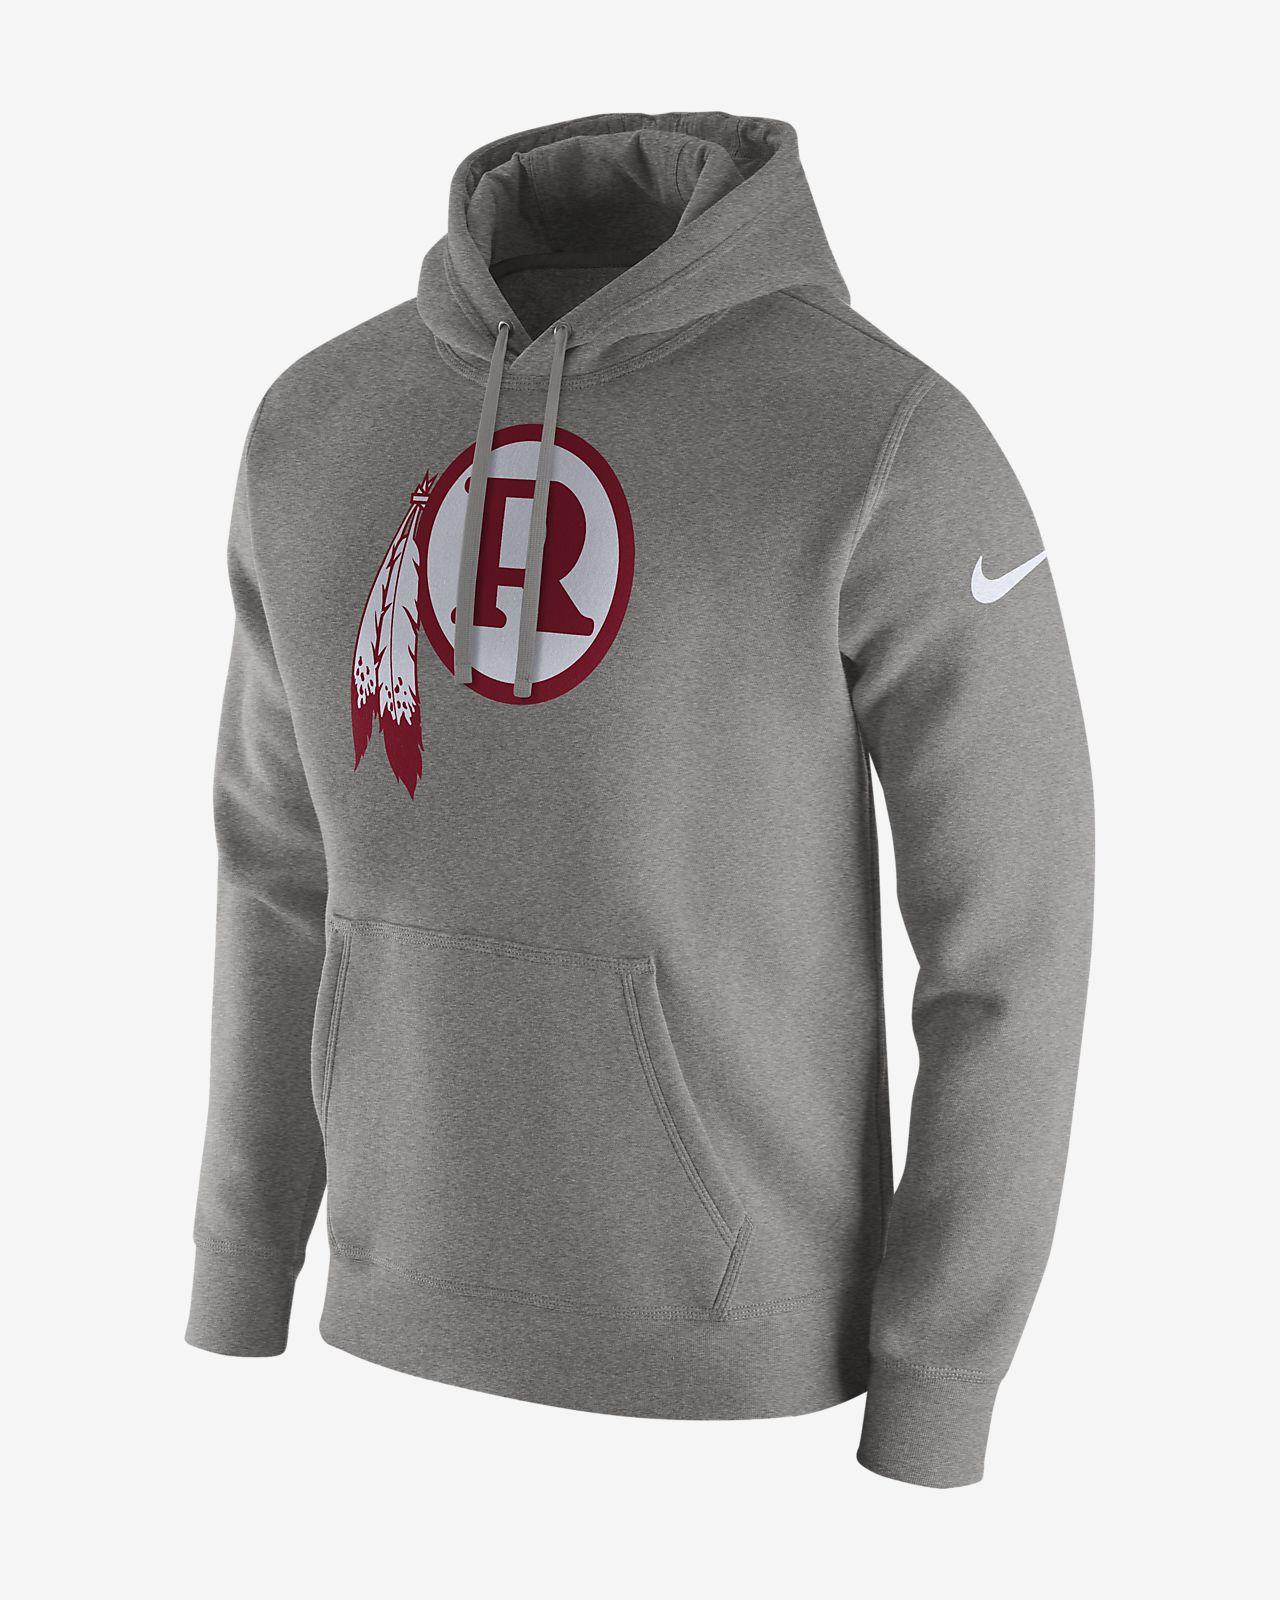 1baafa897 Nike Club (NFL Redskins) Men's Fleece Pullover Hoodie. Nike.com